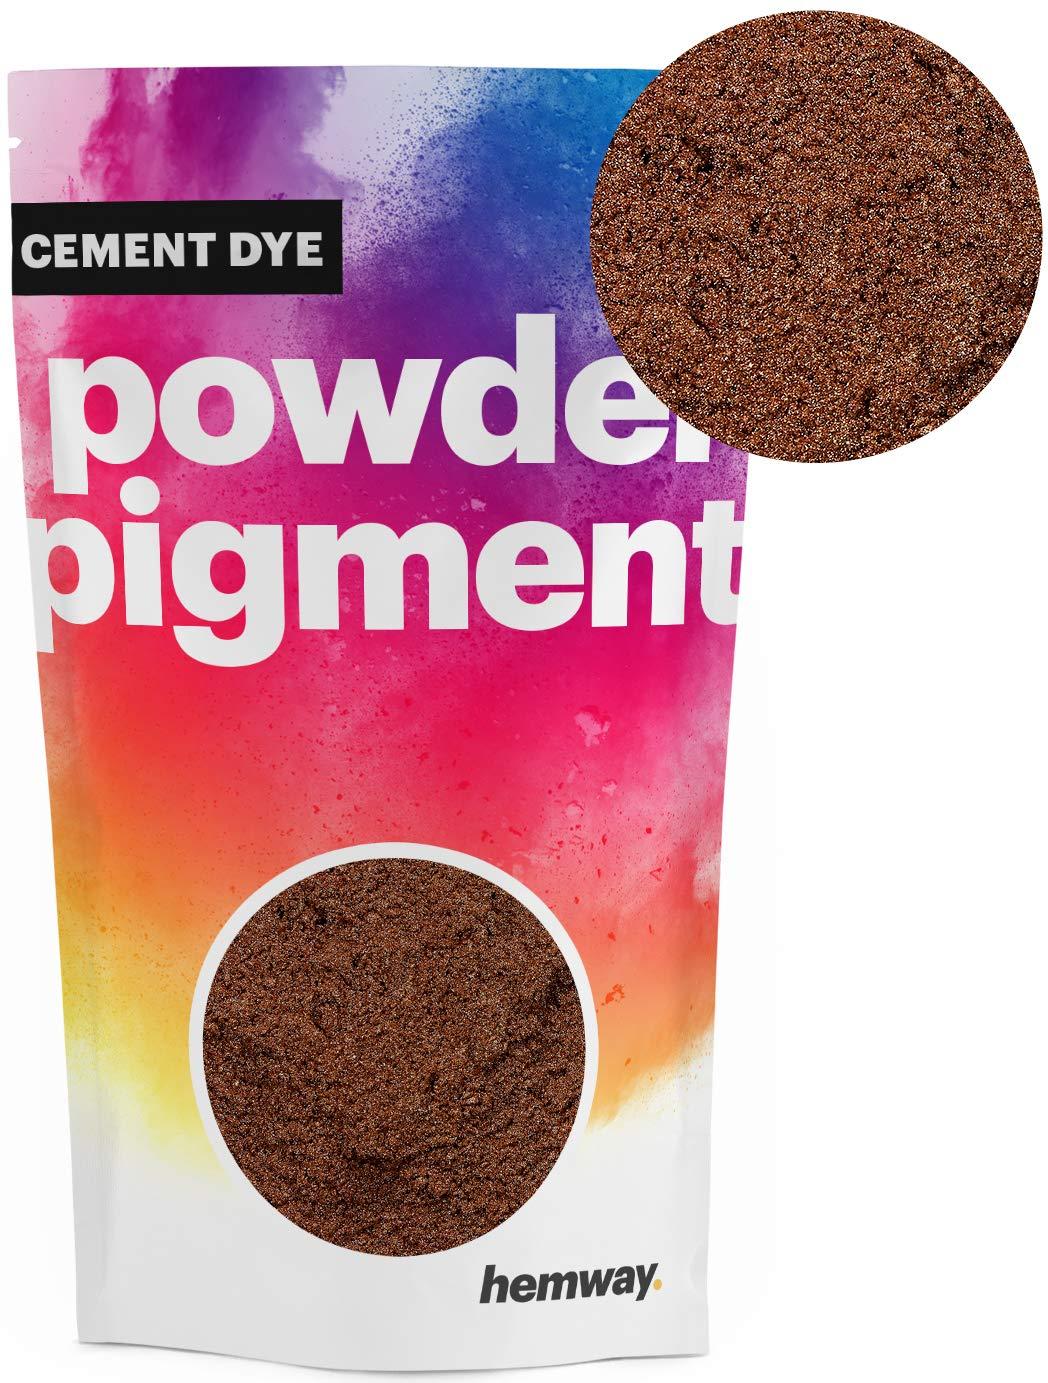 Hemway Cement Dye Powder Pigment Concrete Color Render Mortar Pointing Powdered Brick Toner Plaster (50g / 1.75oz, Metallic Hot Pink)